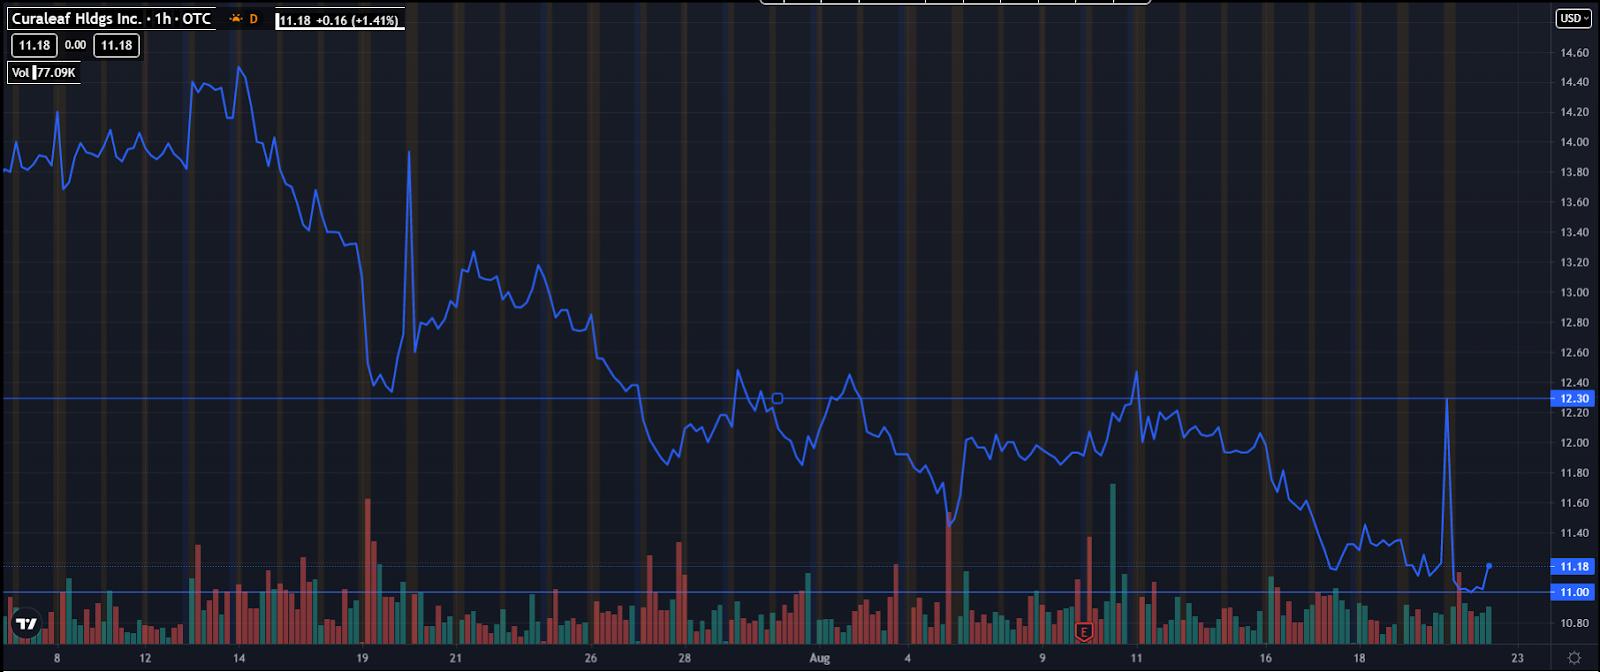 Top Marijuana Penny Stocks 2021 CURLF chart